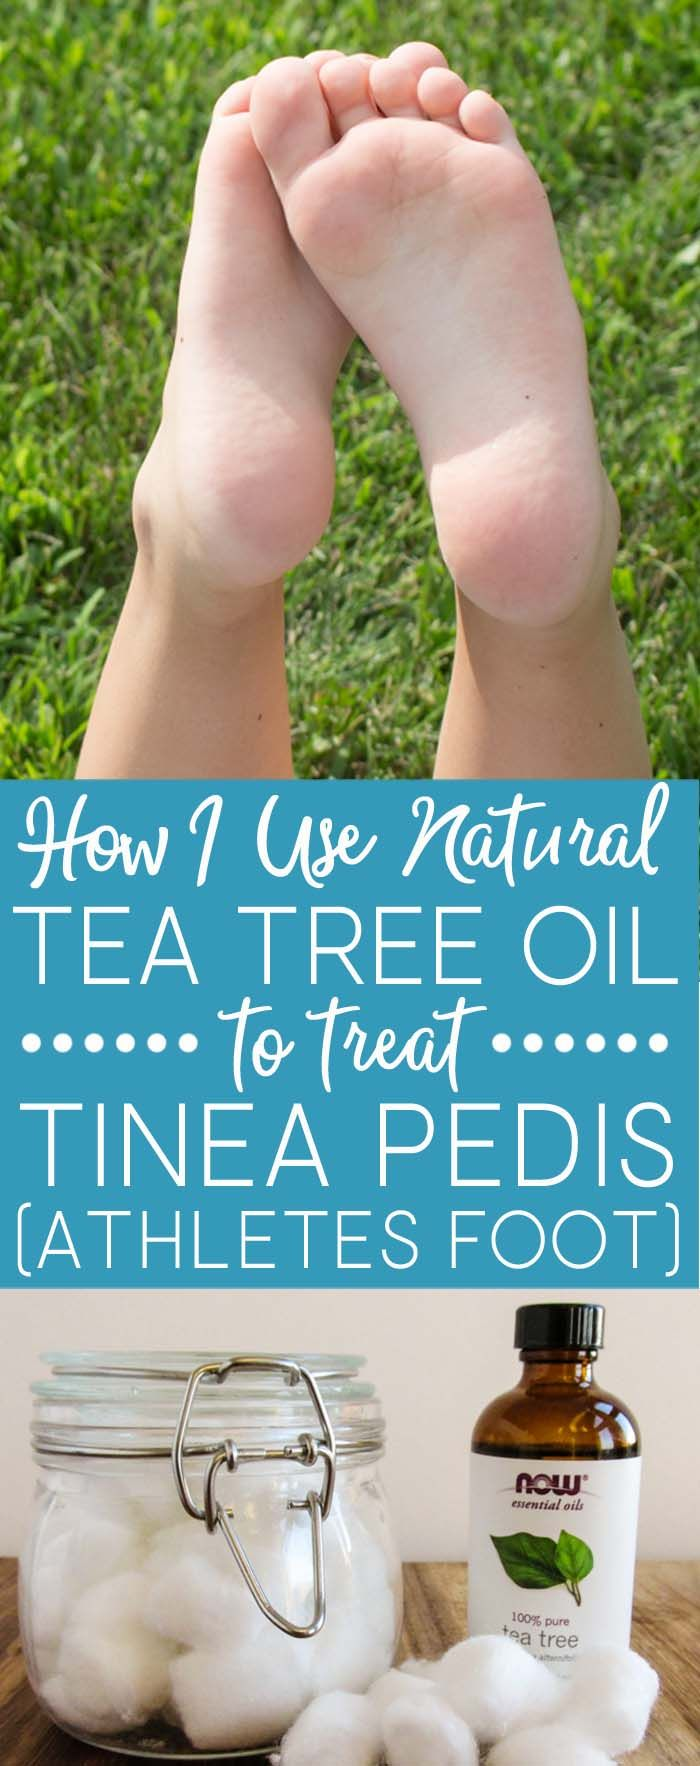 How I Use Tea Tree Oil to Treat Tinea Pedis (Athletes Foot)Bren @ BrenDid.com